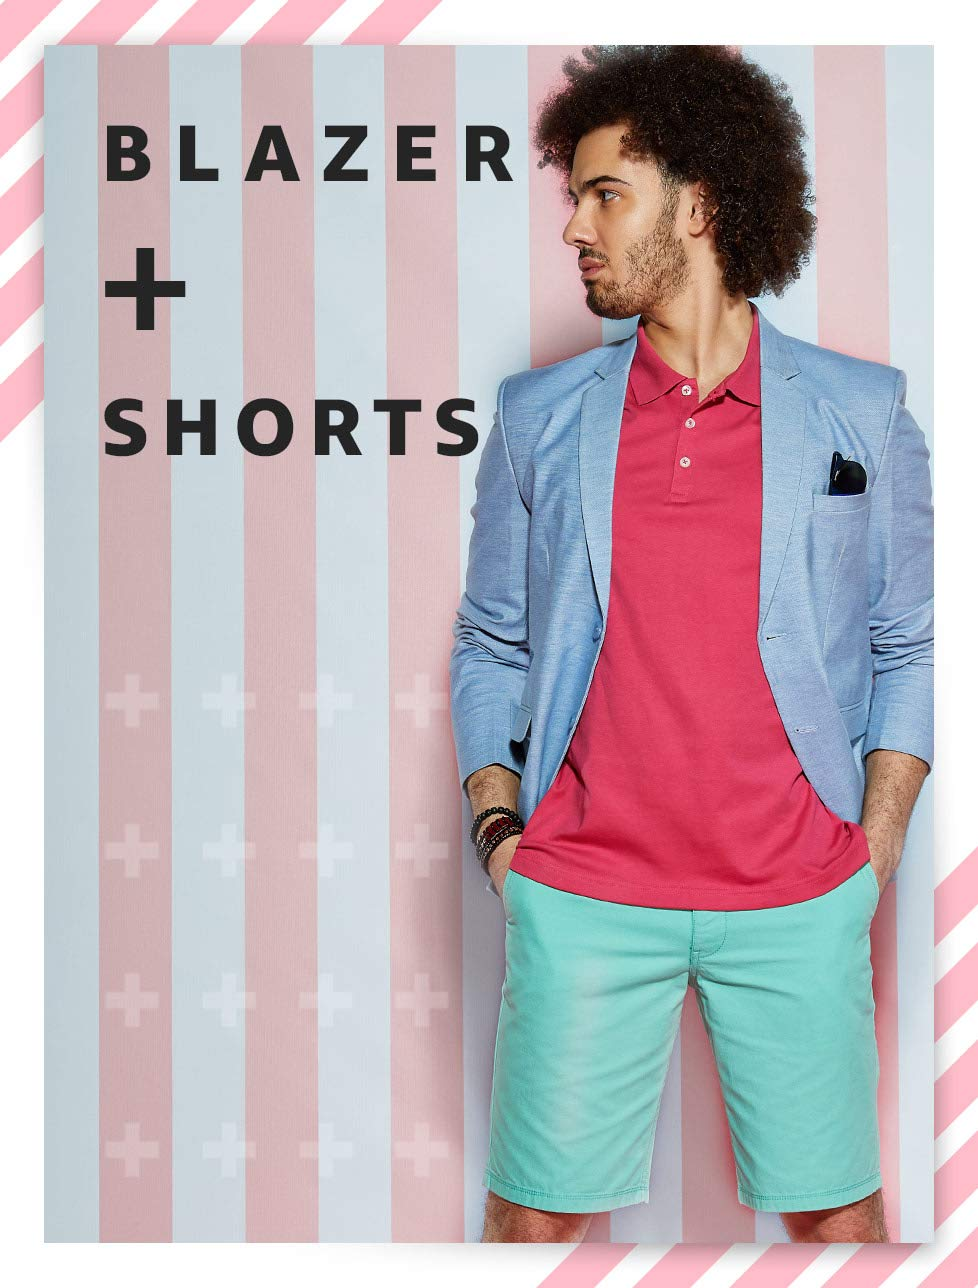 Blazers + Shorts